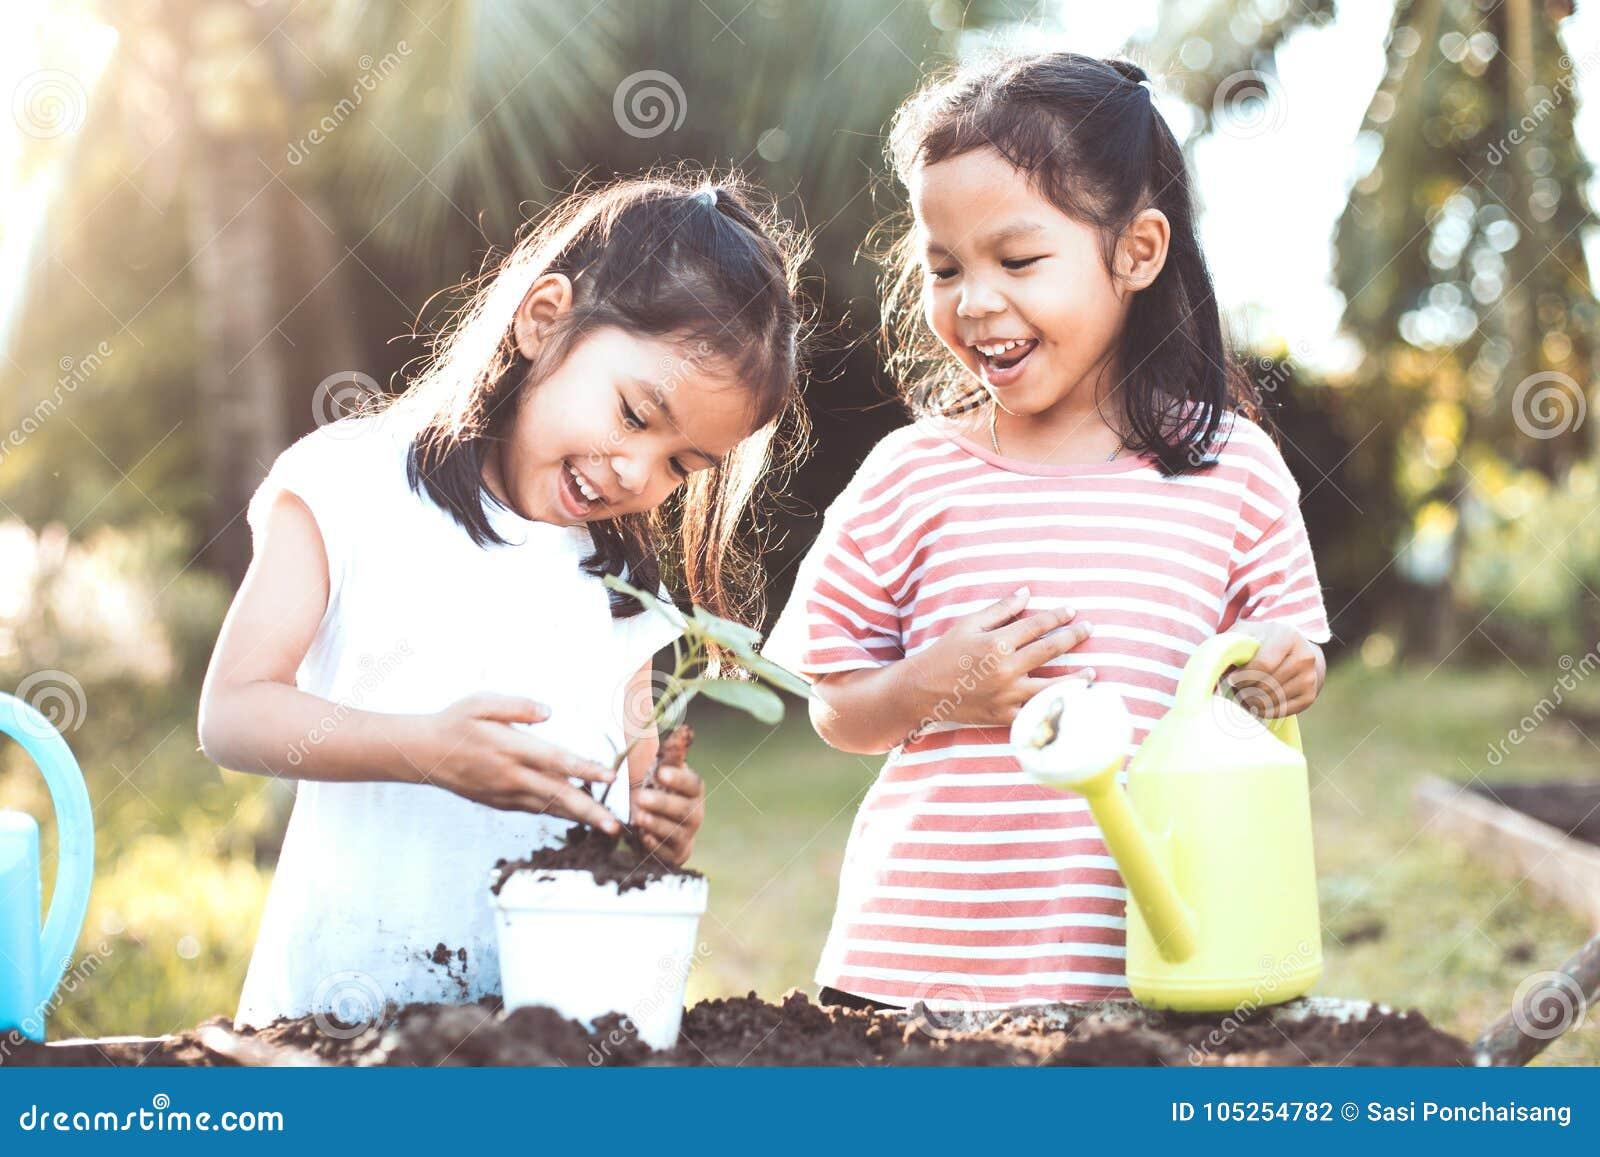 A plant that makes children happy 80